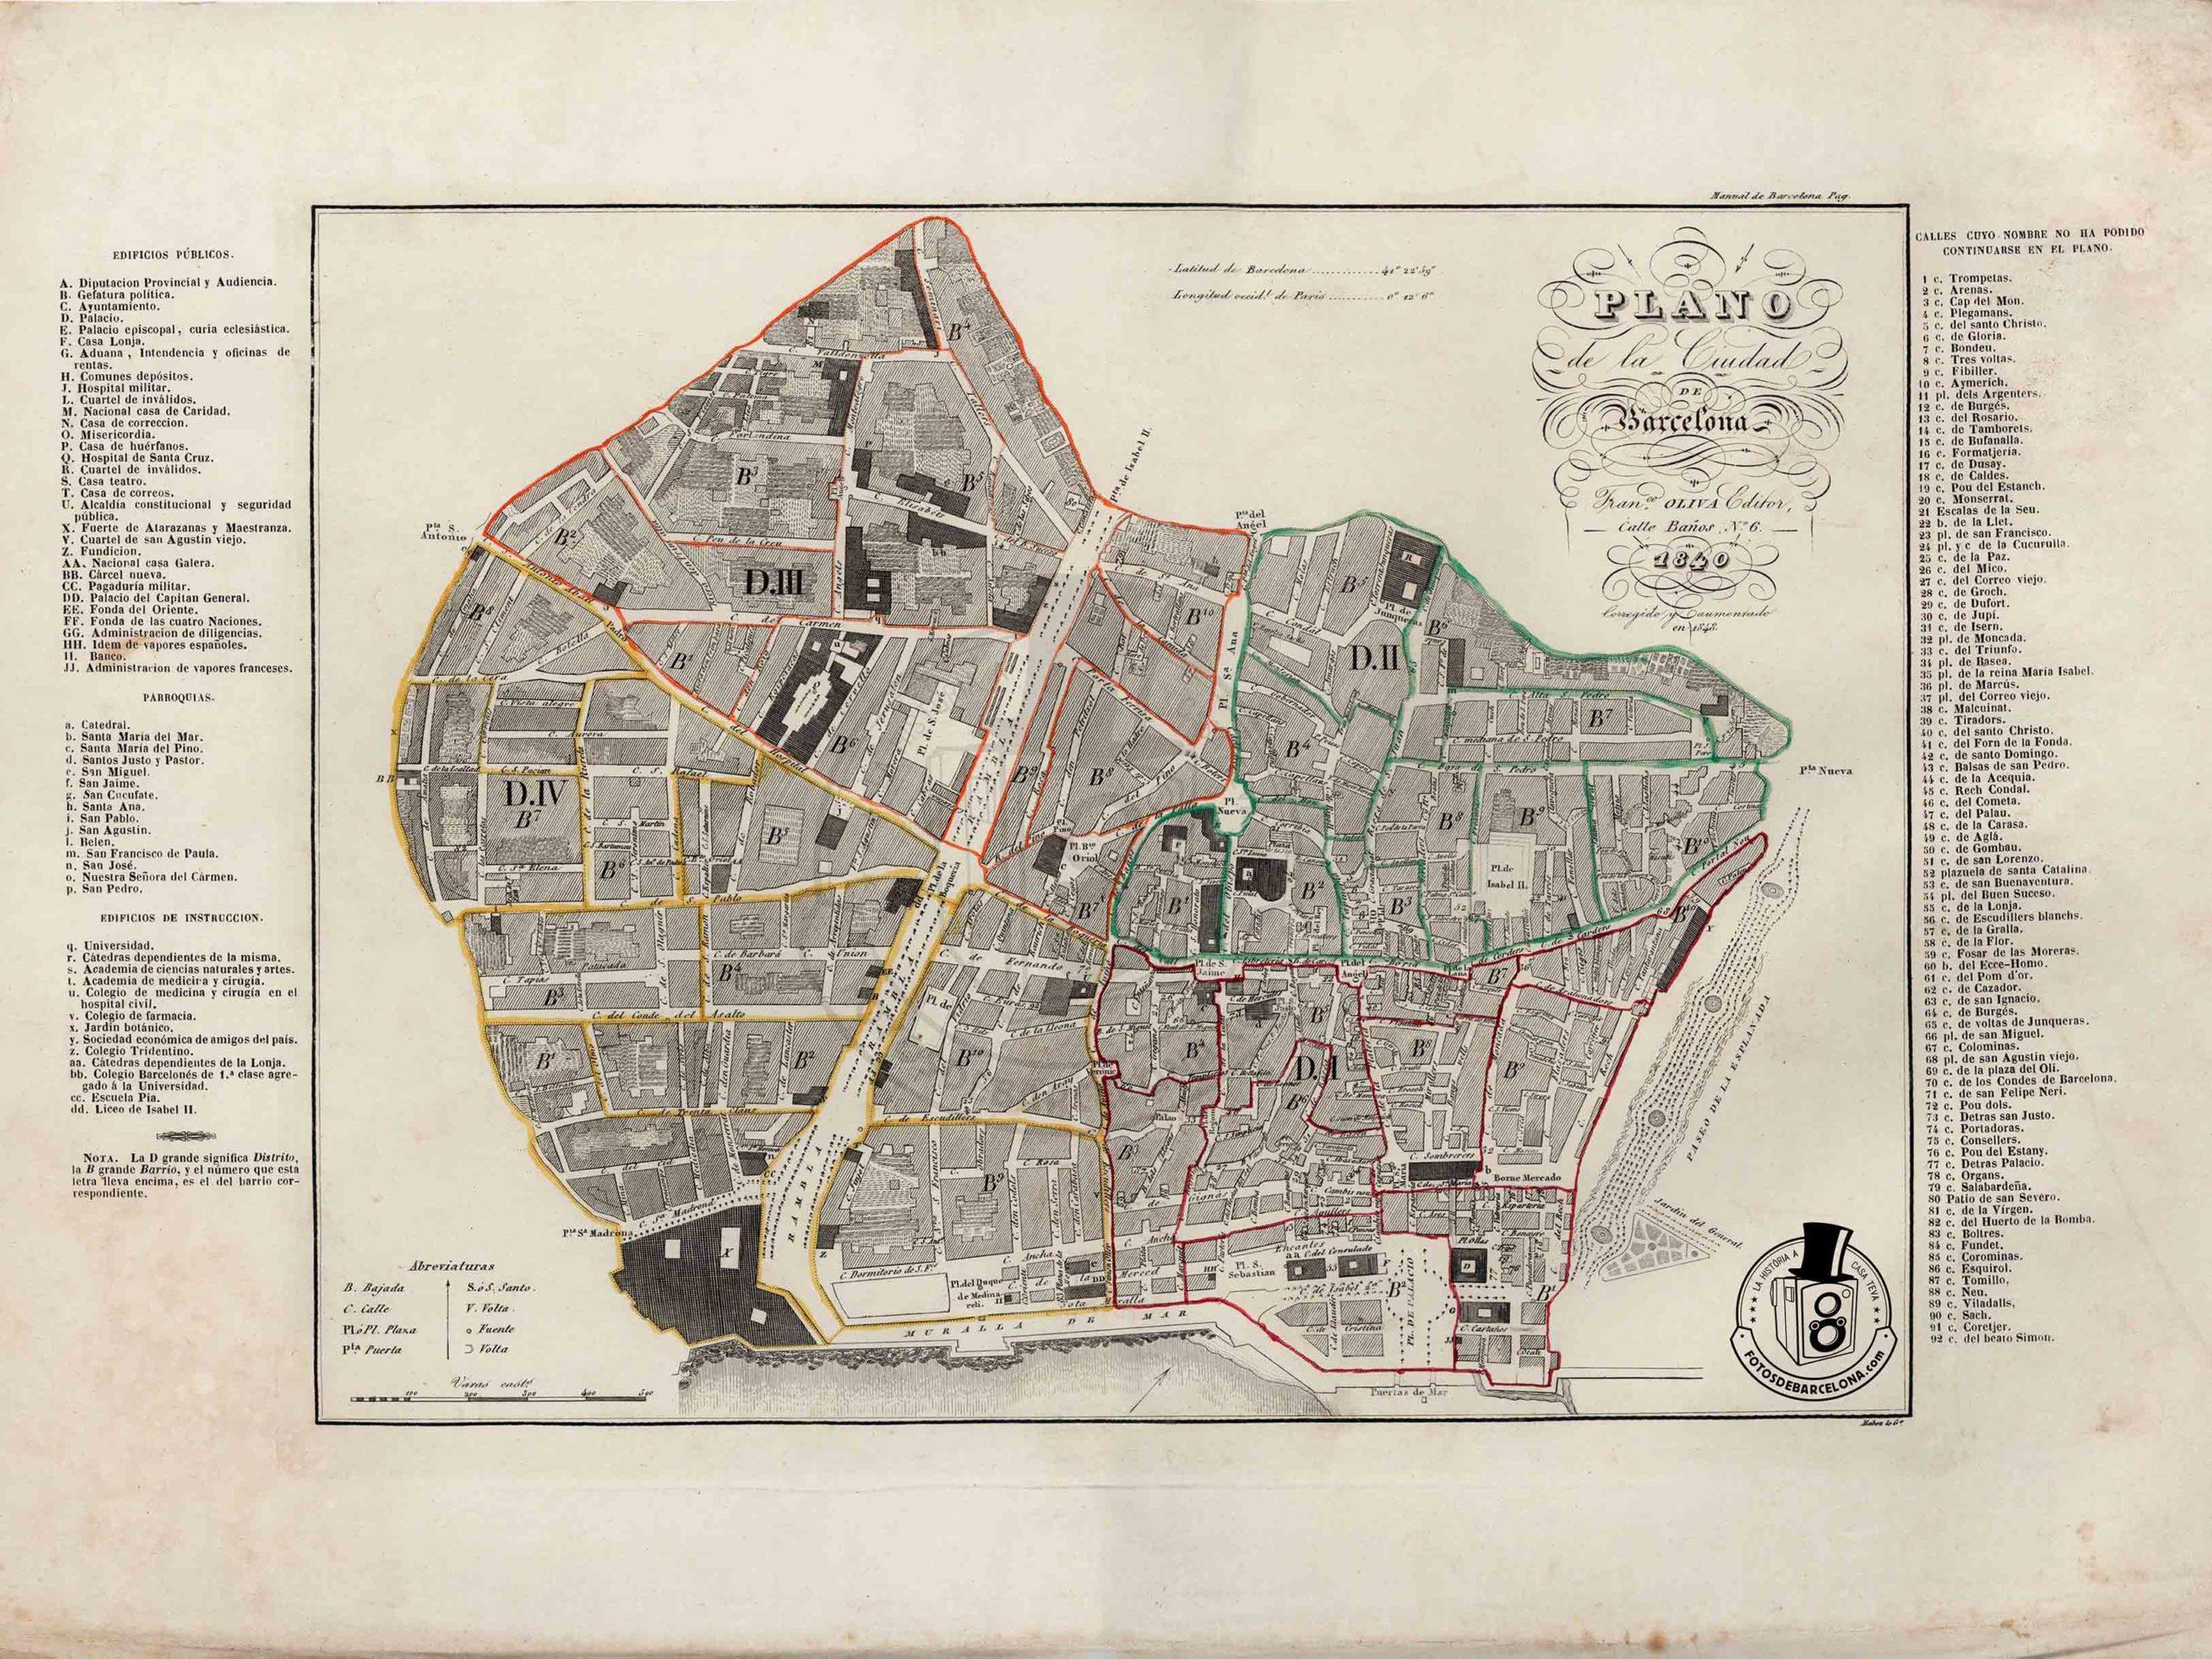 Plano de Barcelona 1840